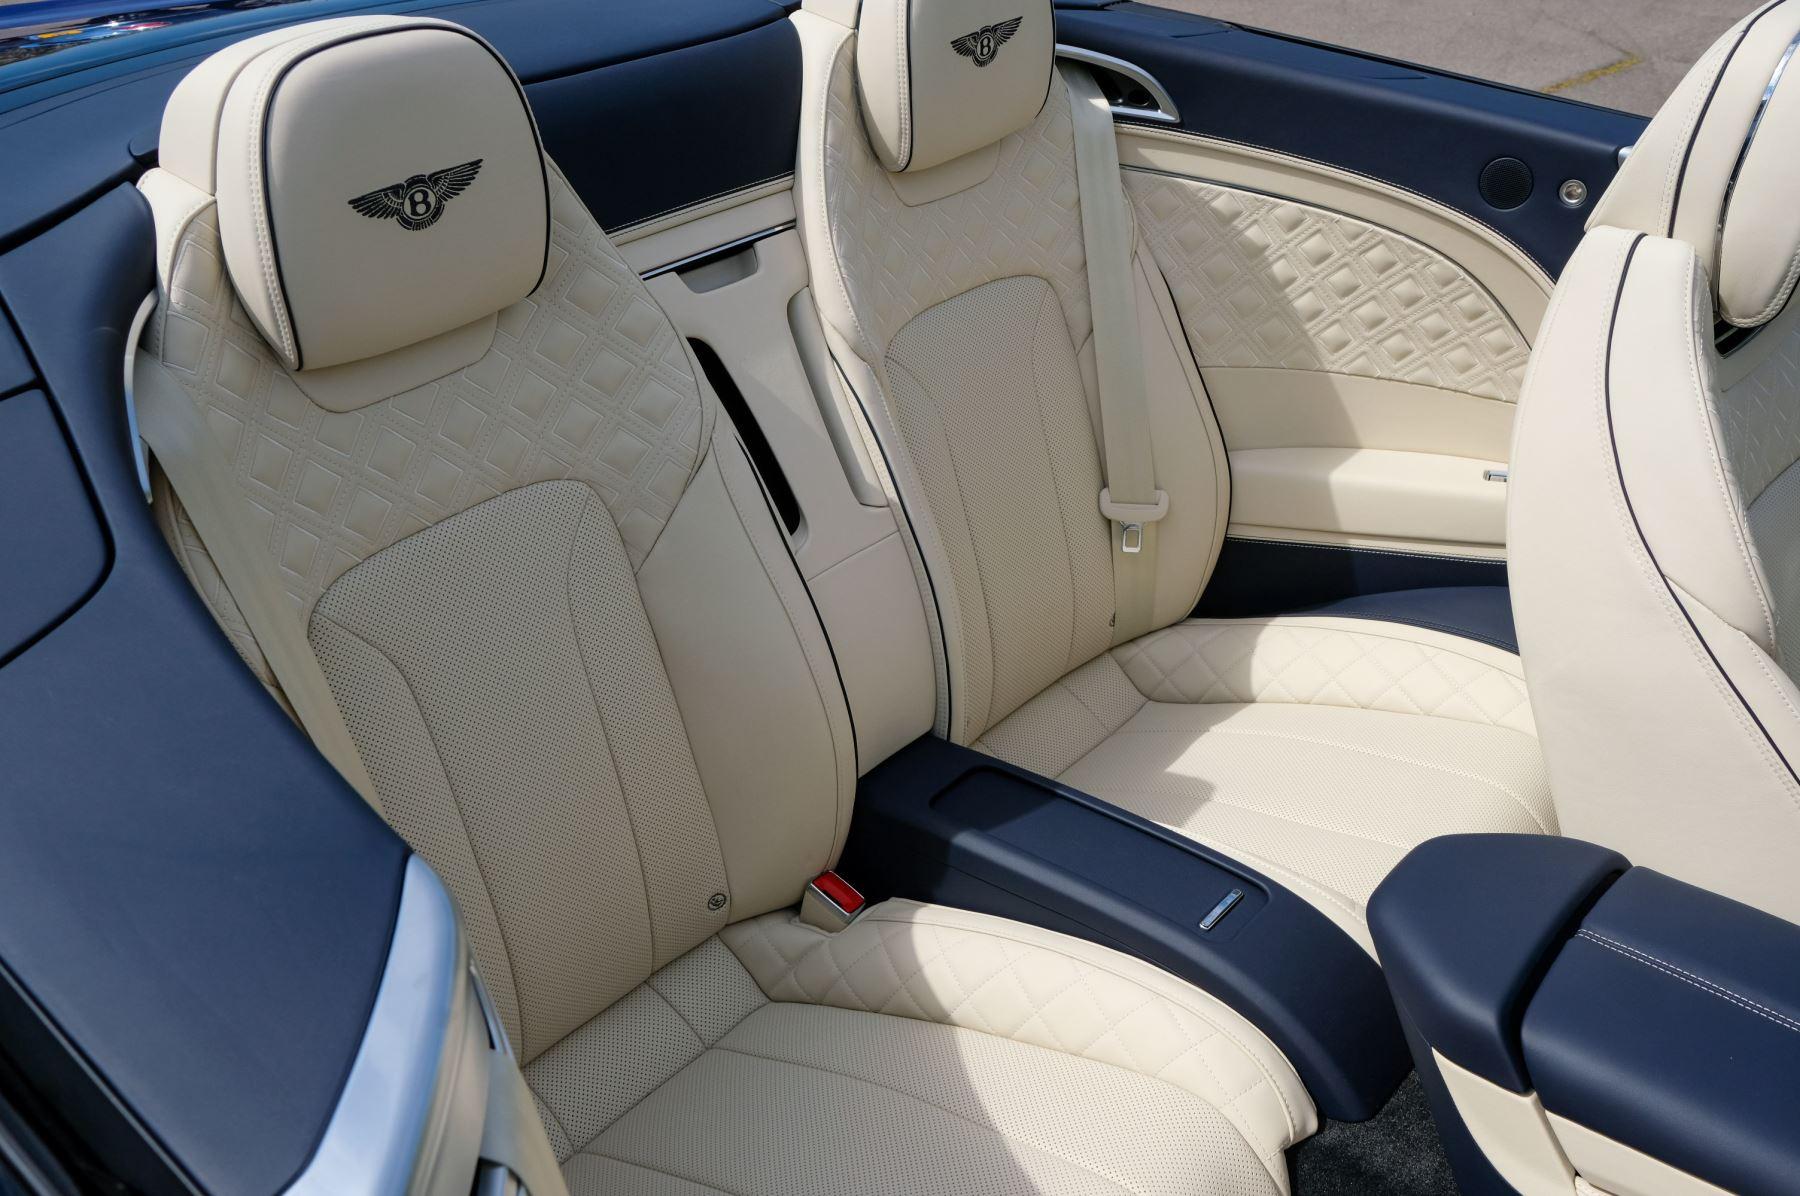 Bentley Continental GTC 4.0 V8 Mulliner Edition 2dr Auto [Tour Spec] image 13